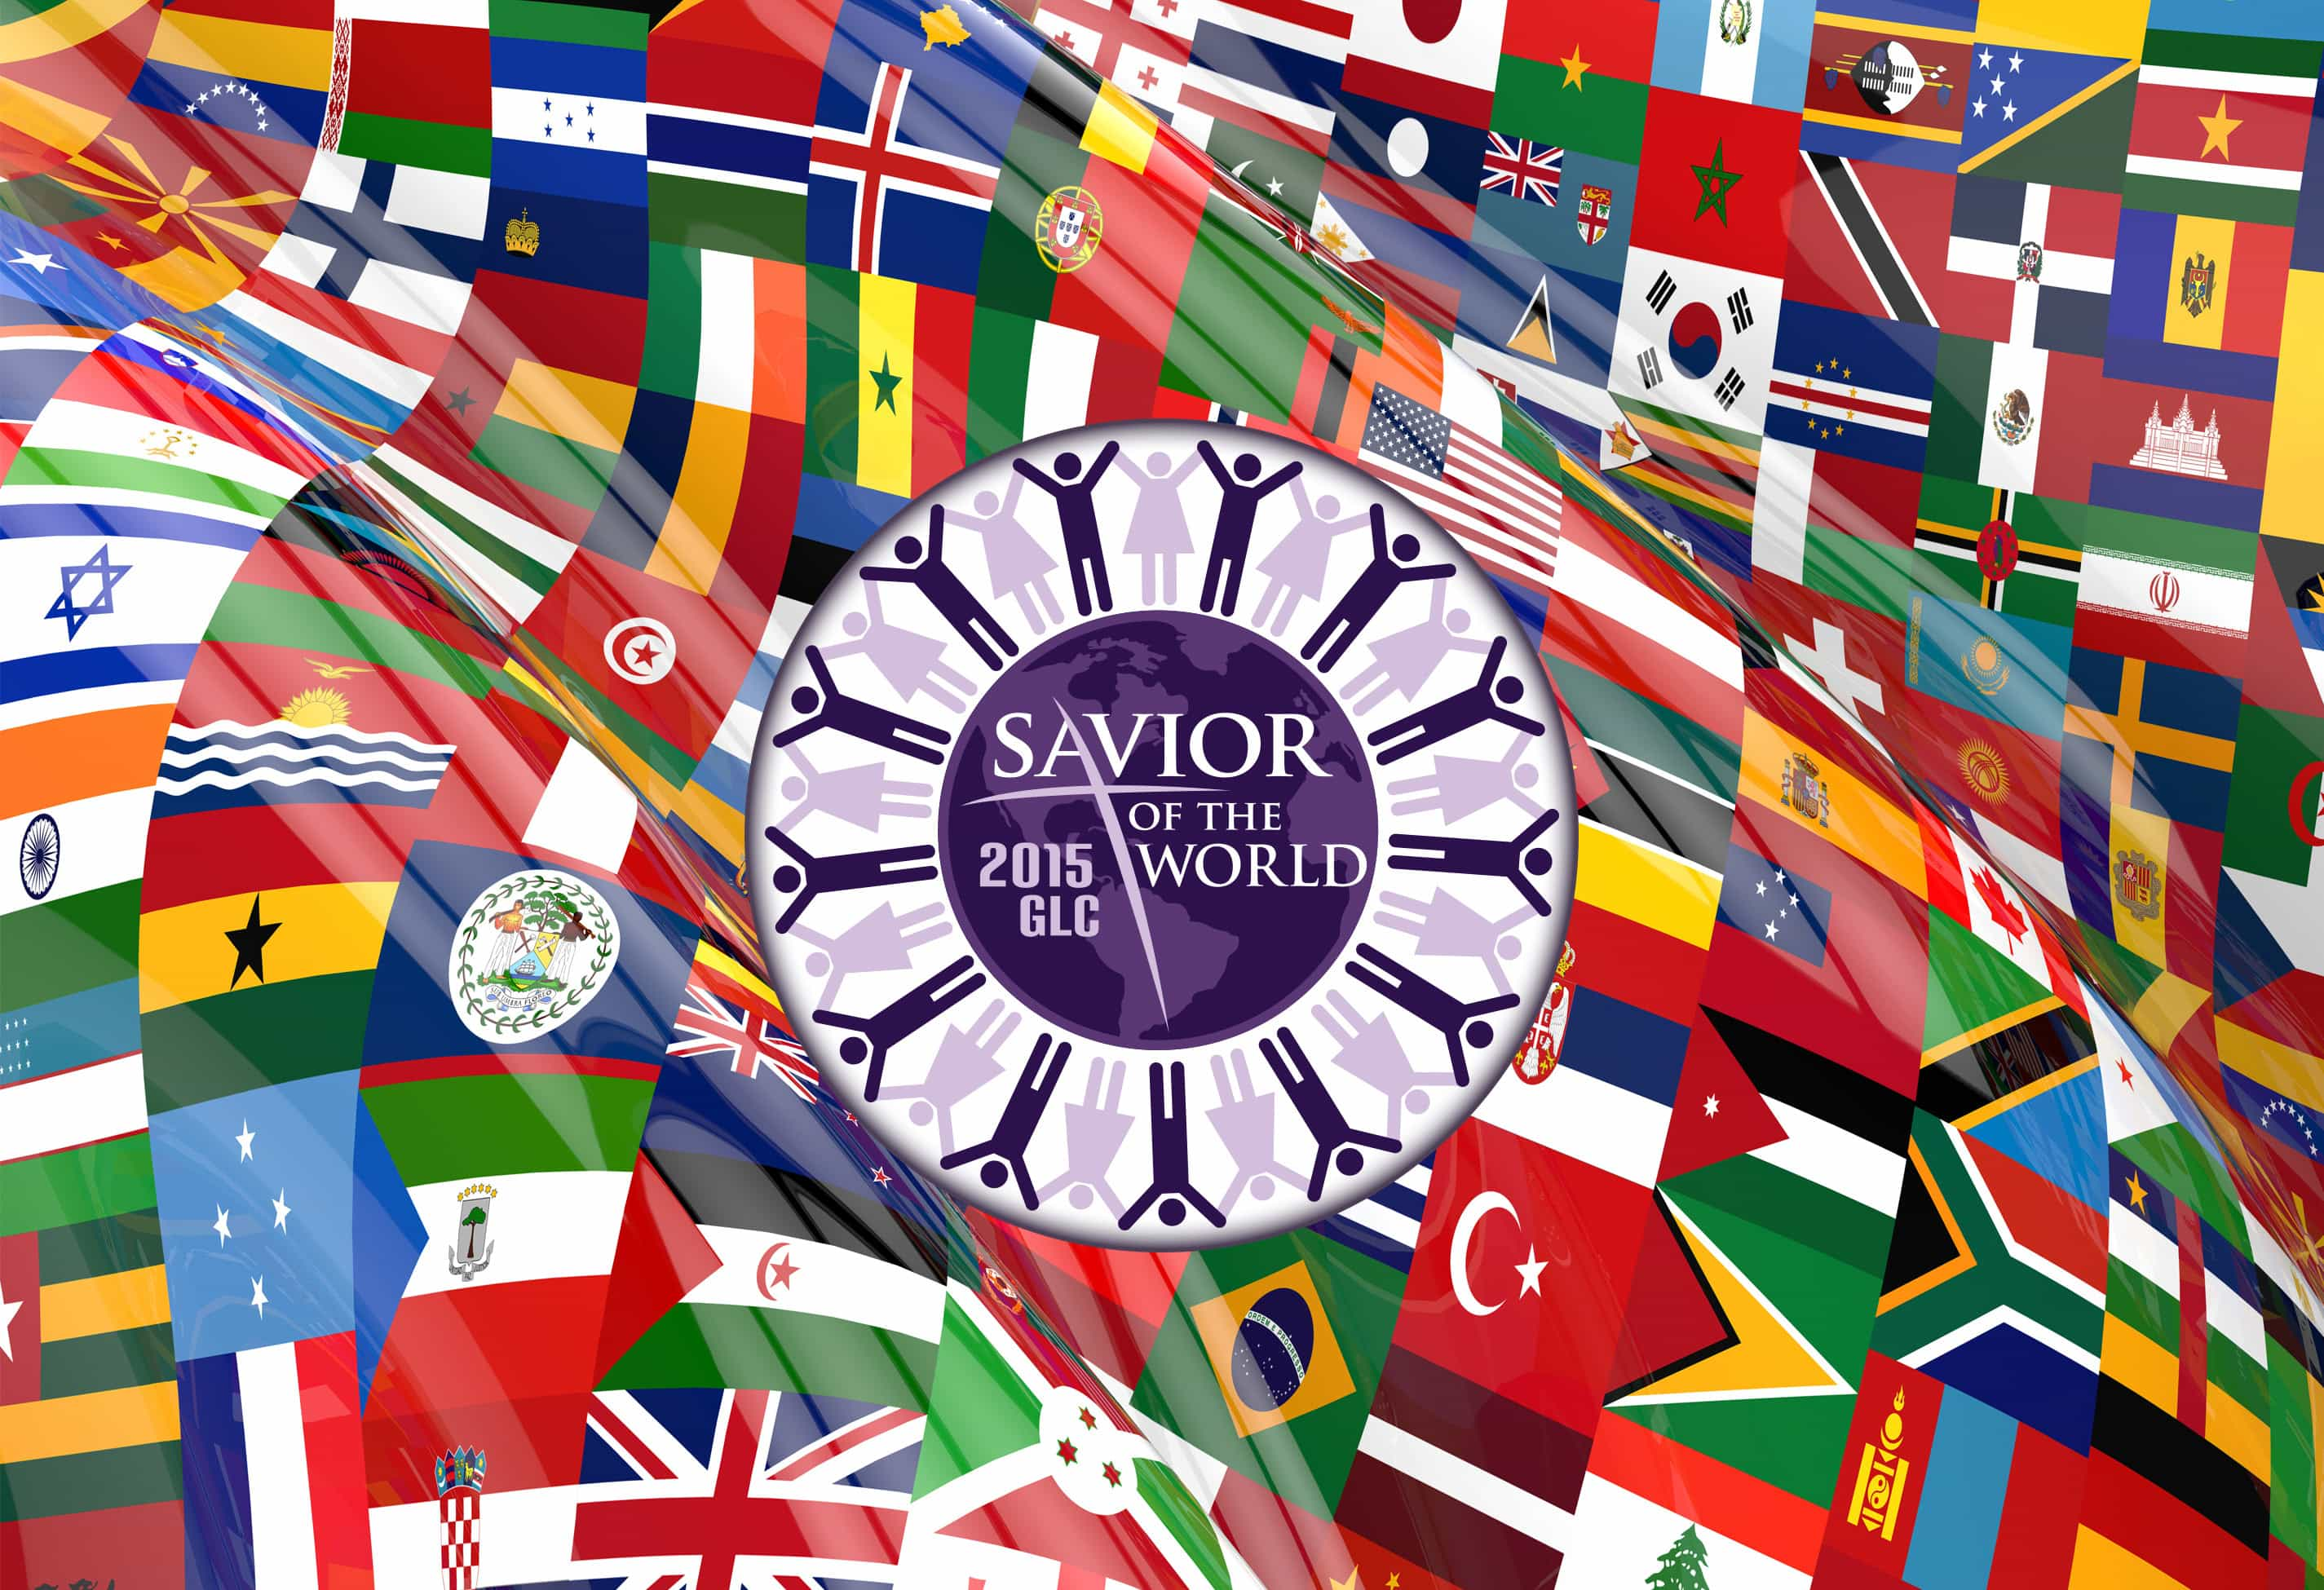 2015 Global Leadership Conference, The Savior of the World